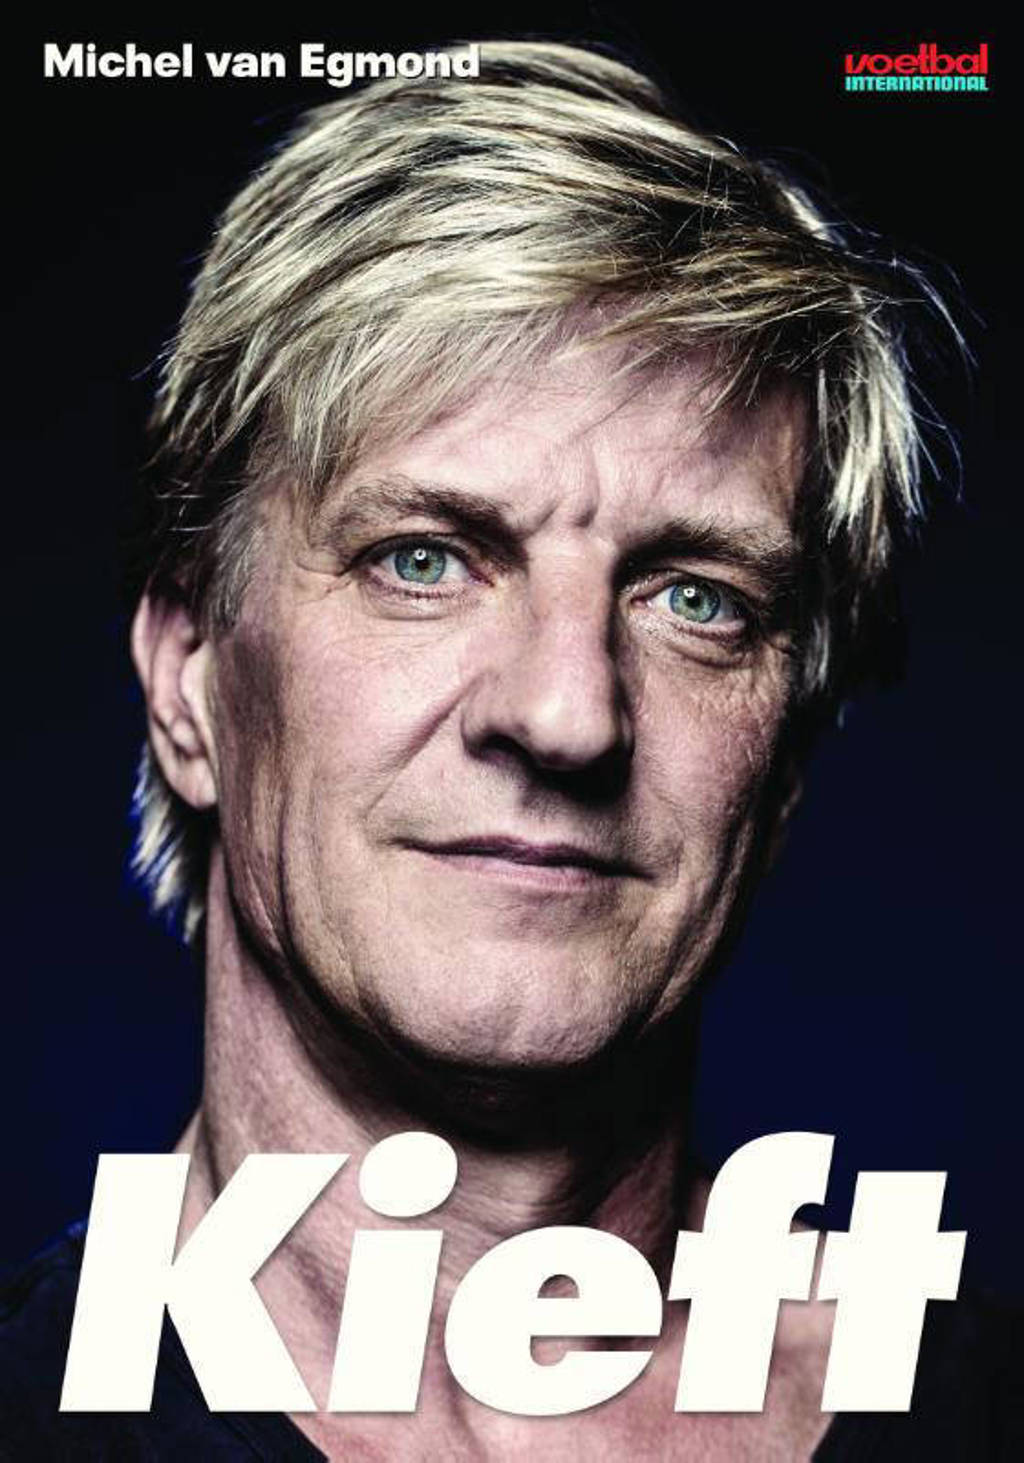 Kieft - Michel van Egmond